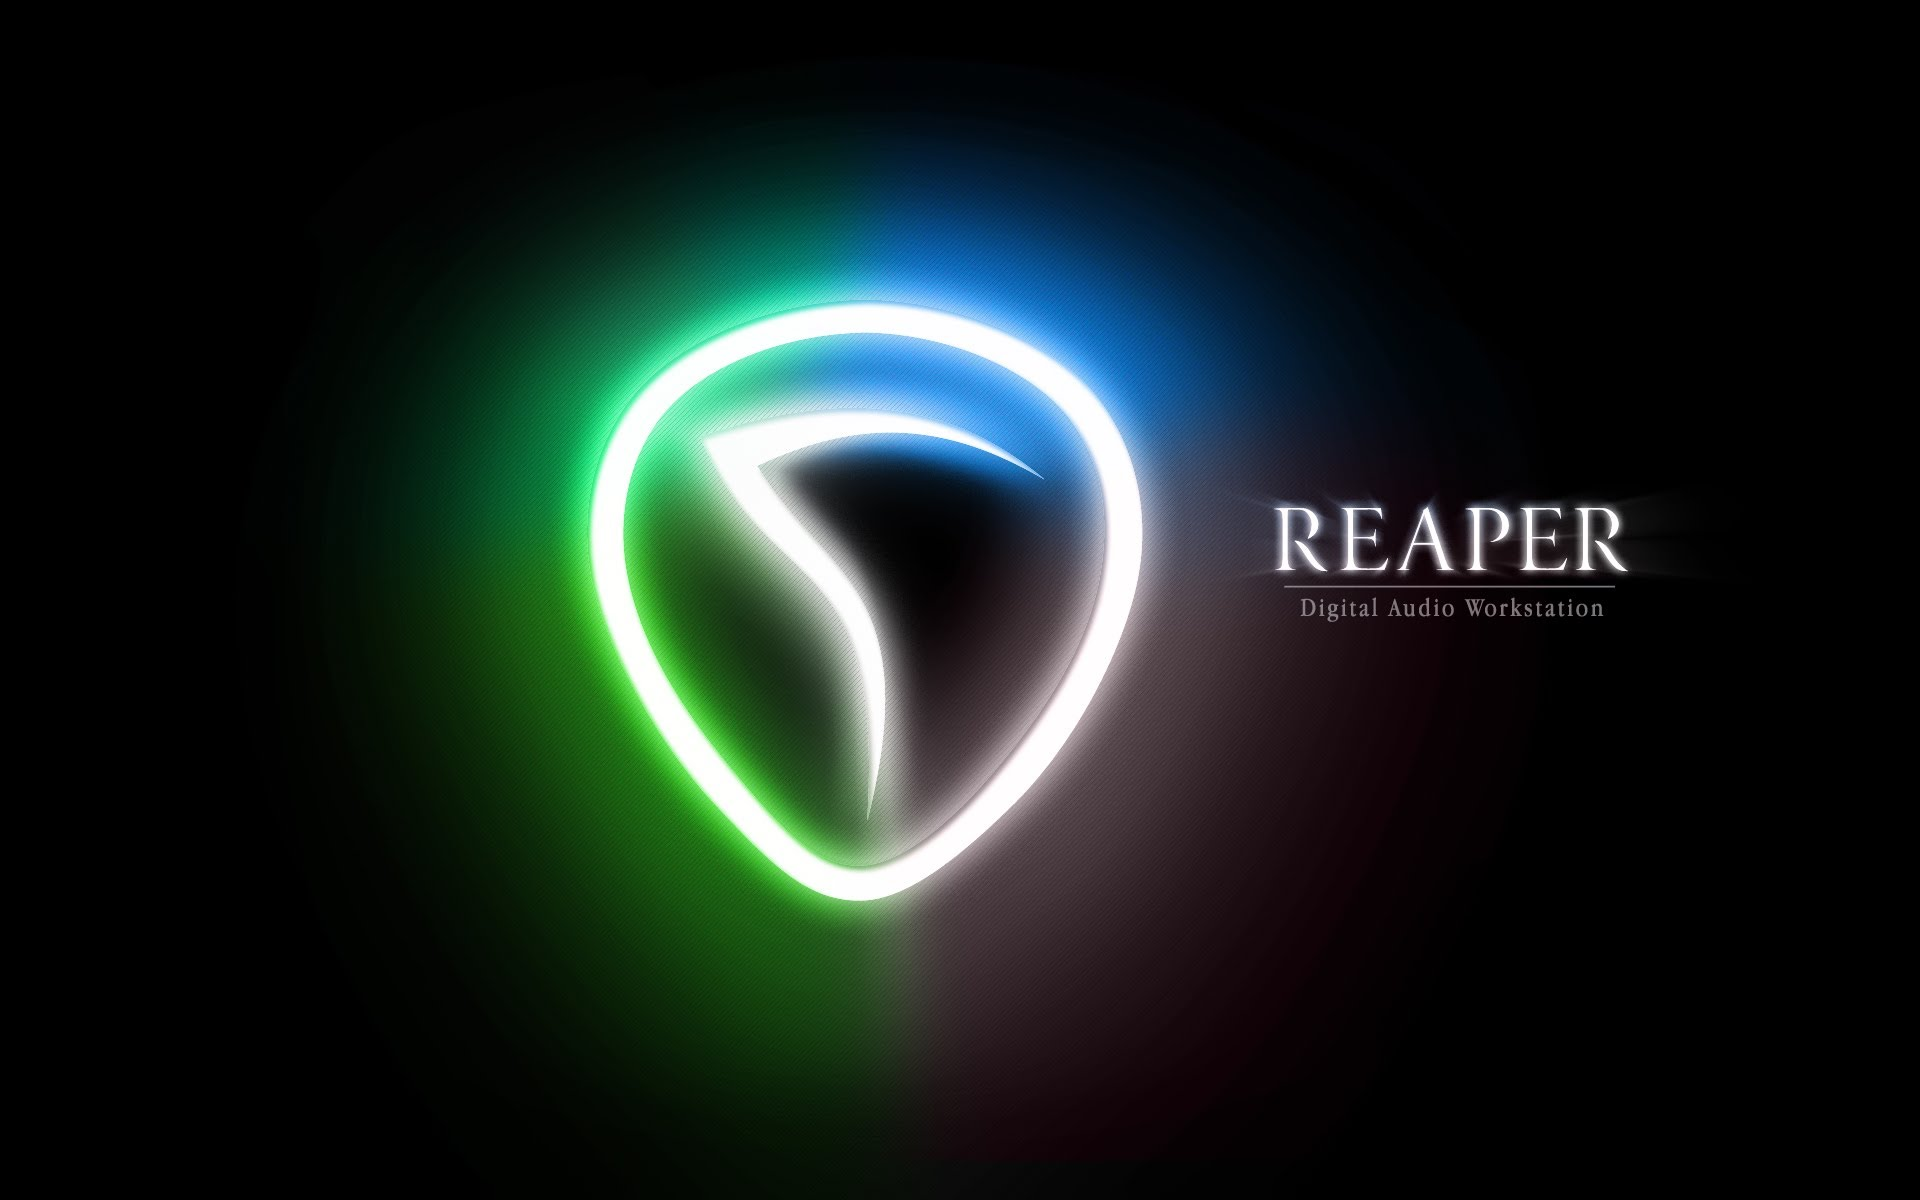 reaper-digital-audio-workstation